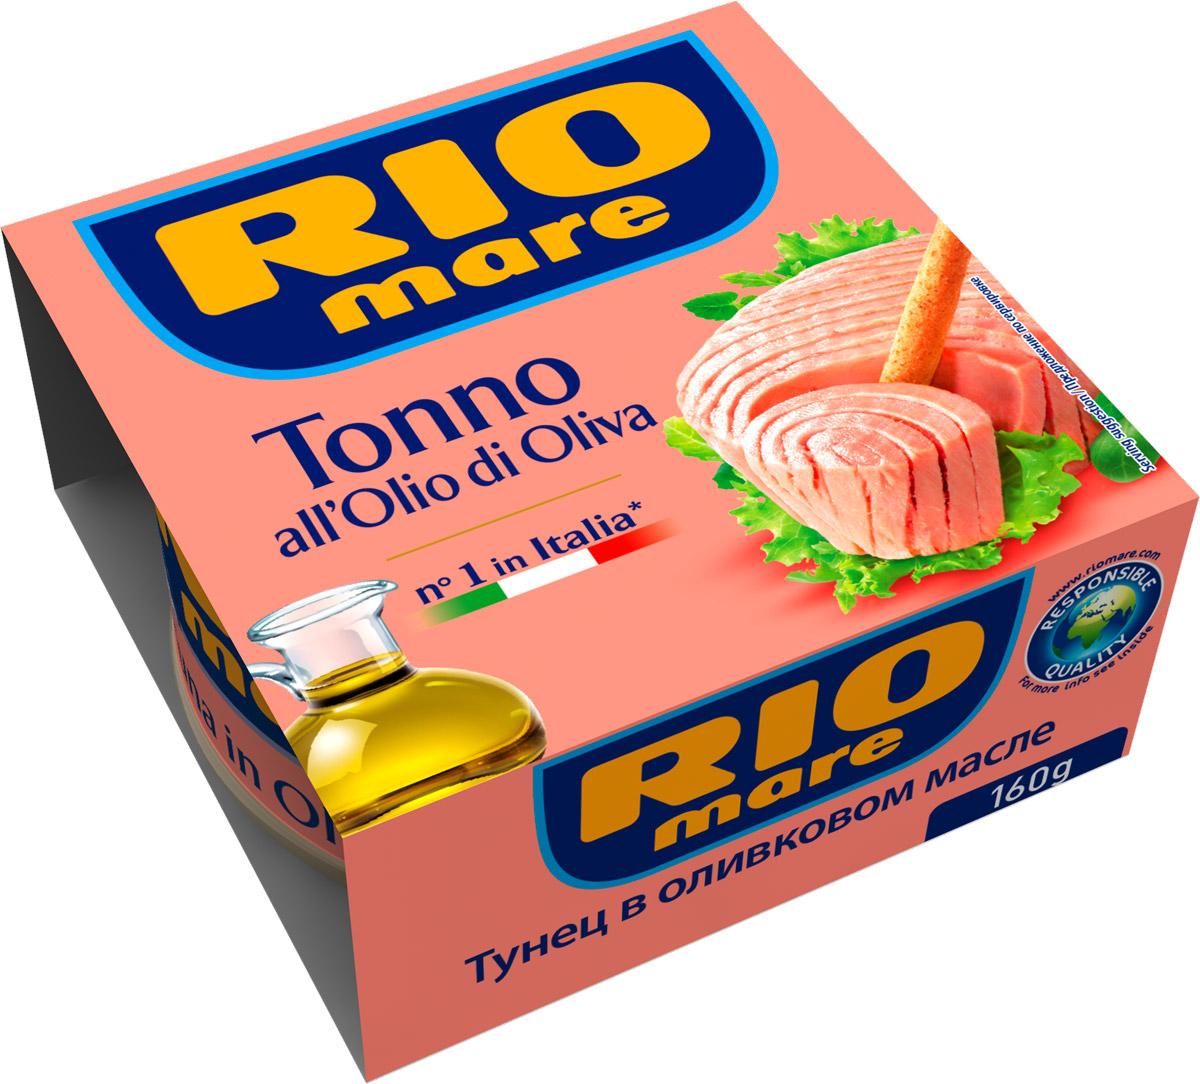 Rio Mare тунец в оливковом масле, 160 г томаты сушеные bioitalia в оливковом масле 180г